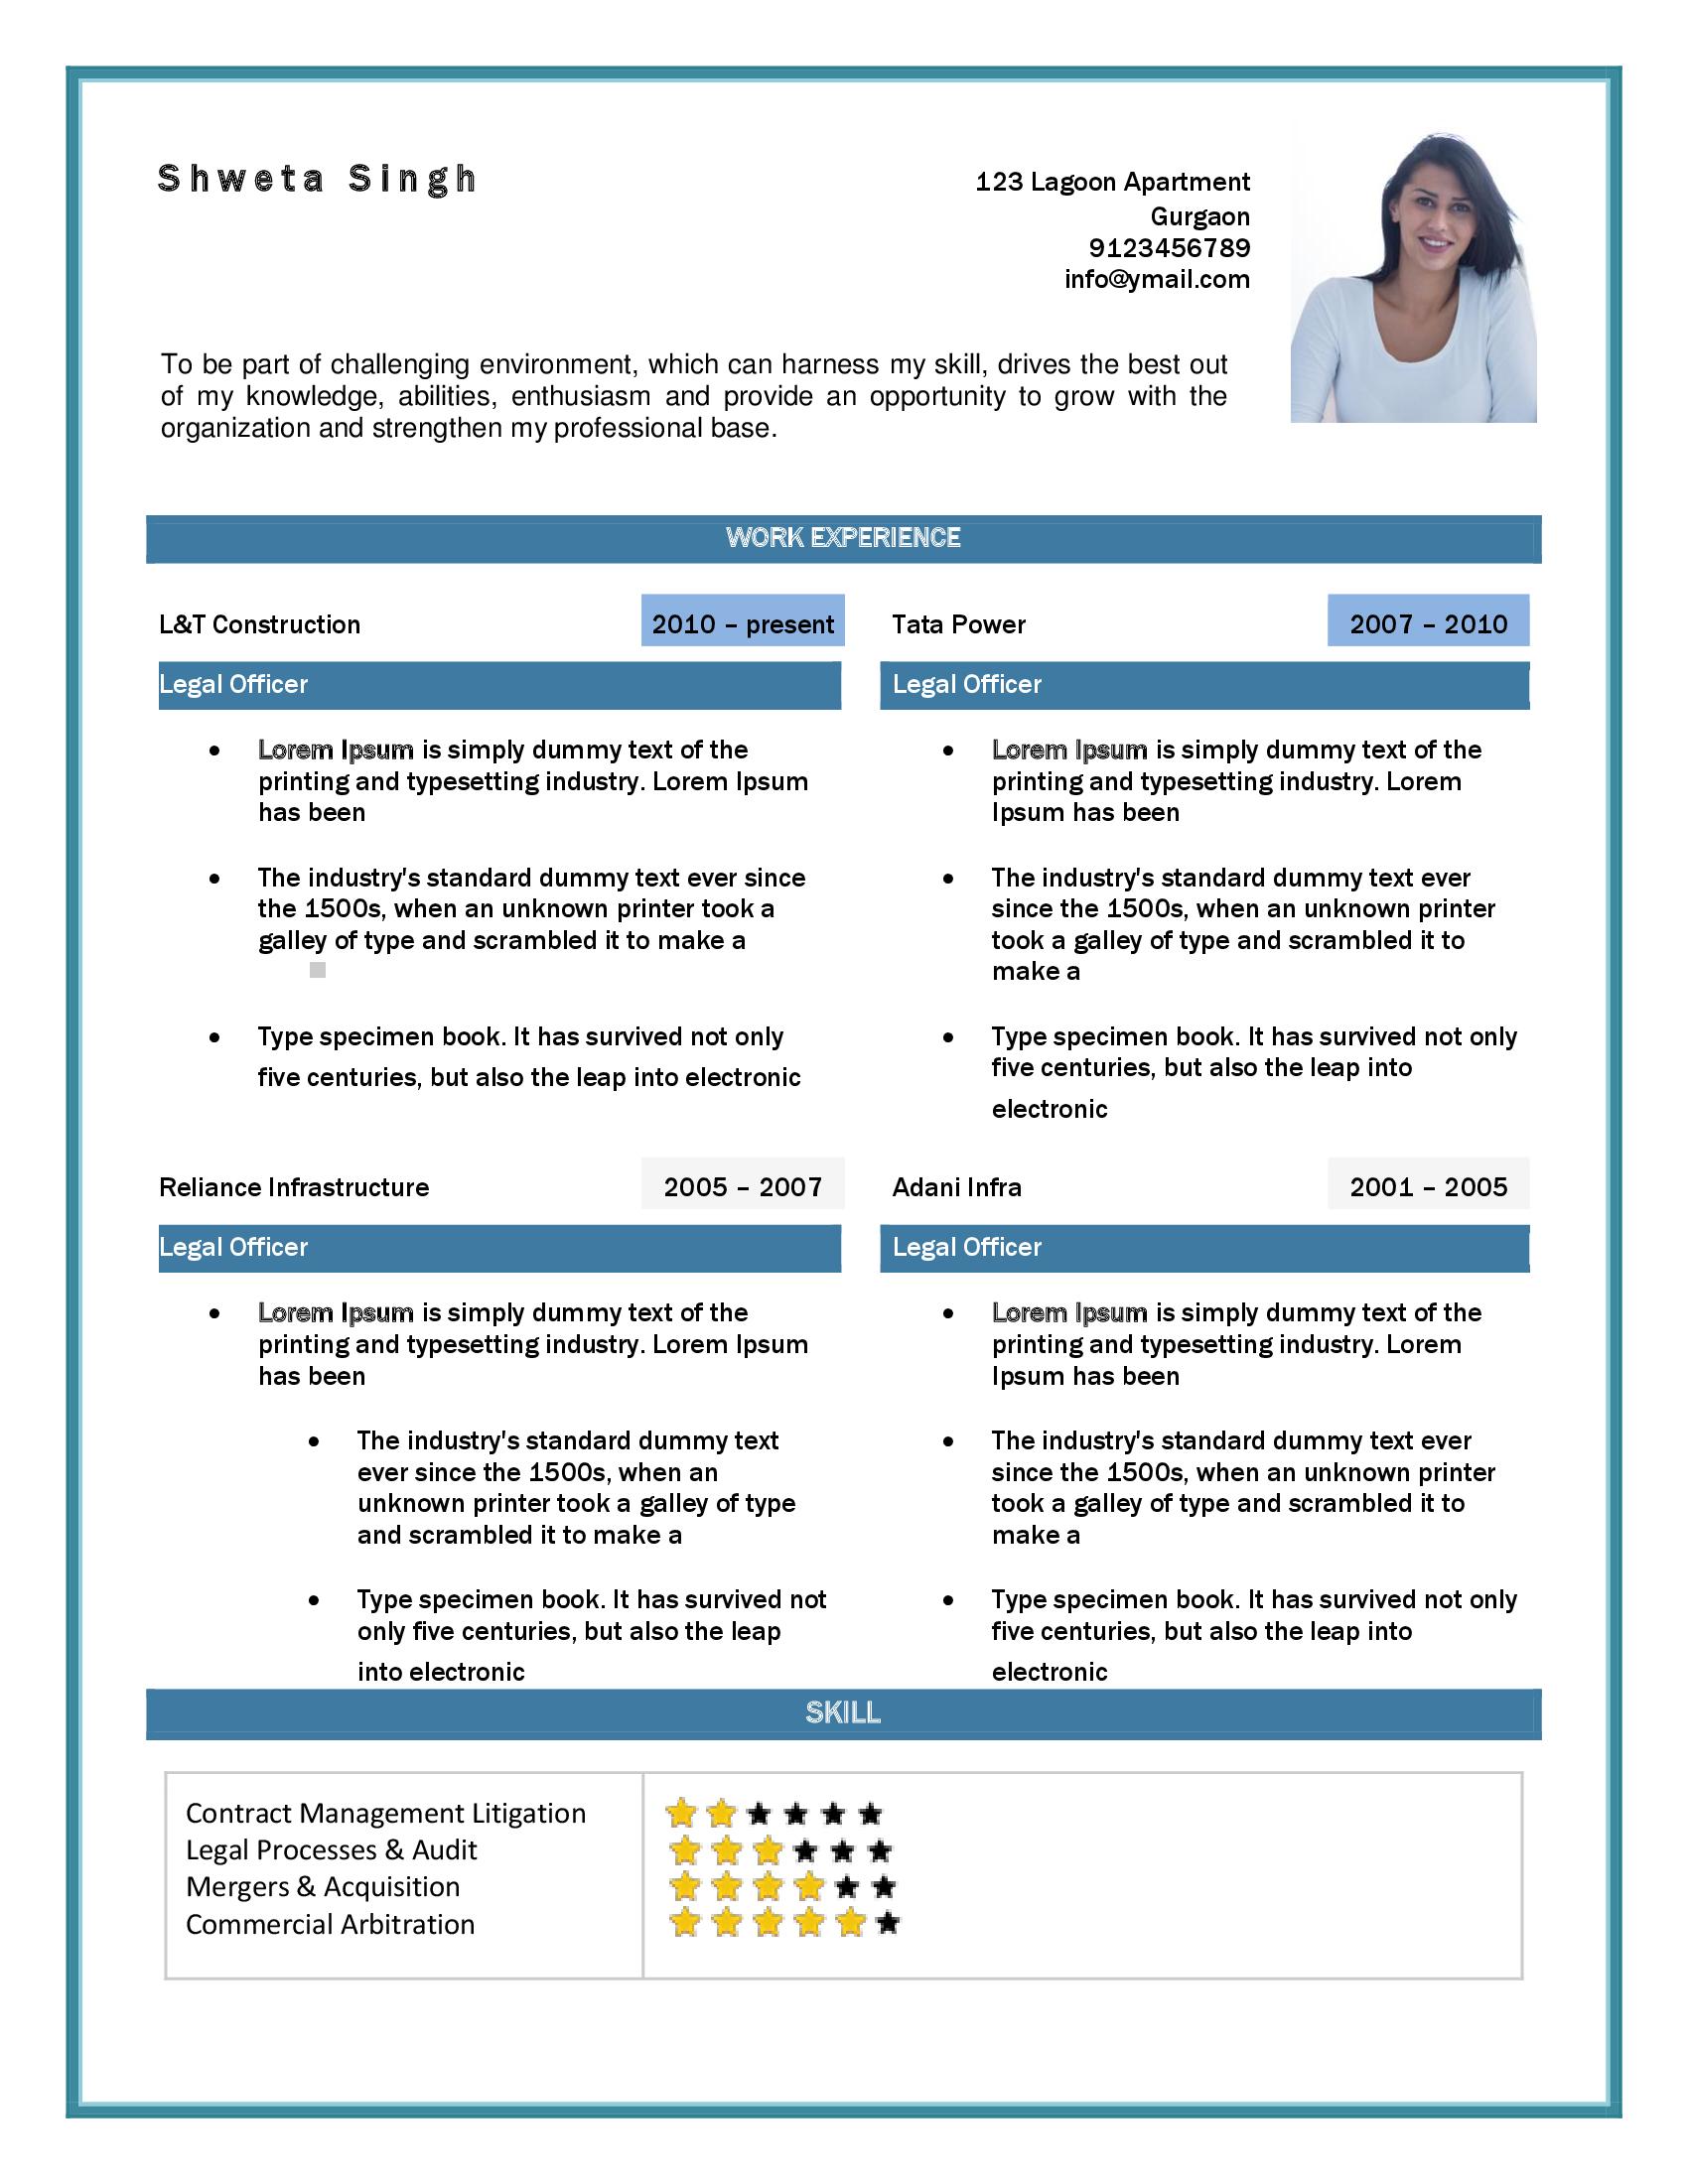 seo executive resume seo executive resume format seo executive